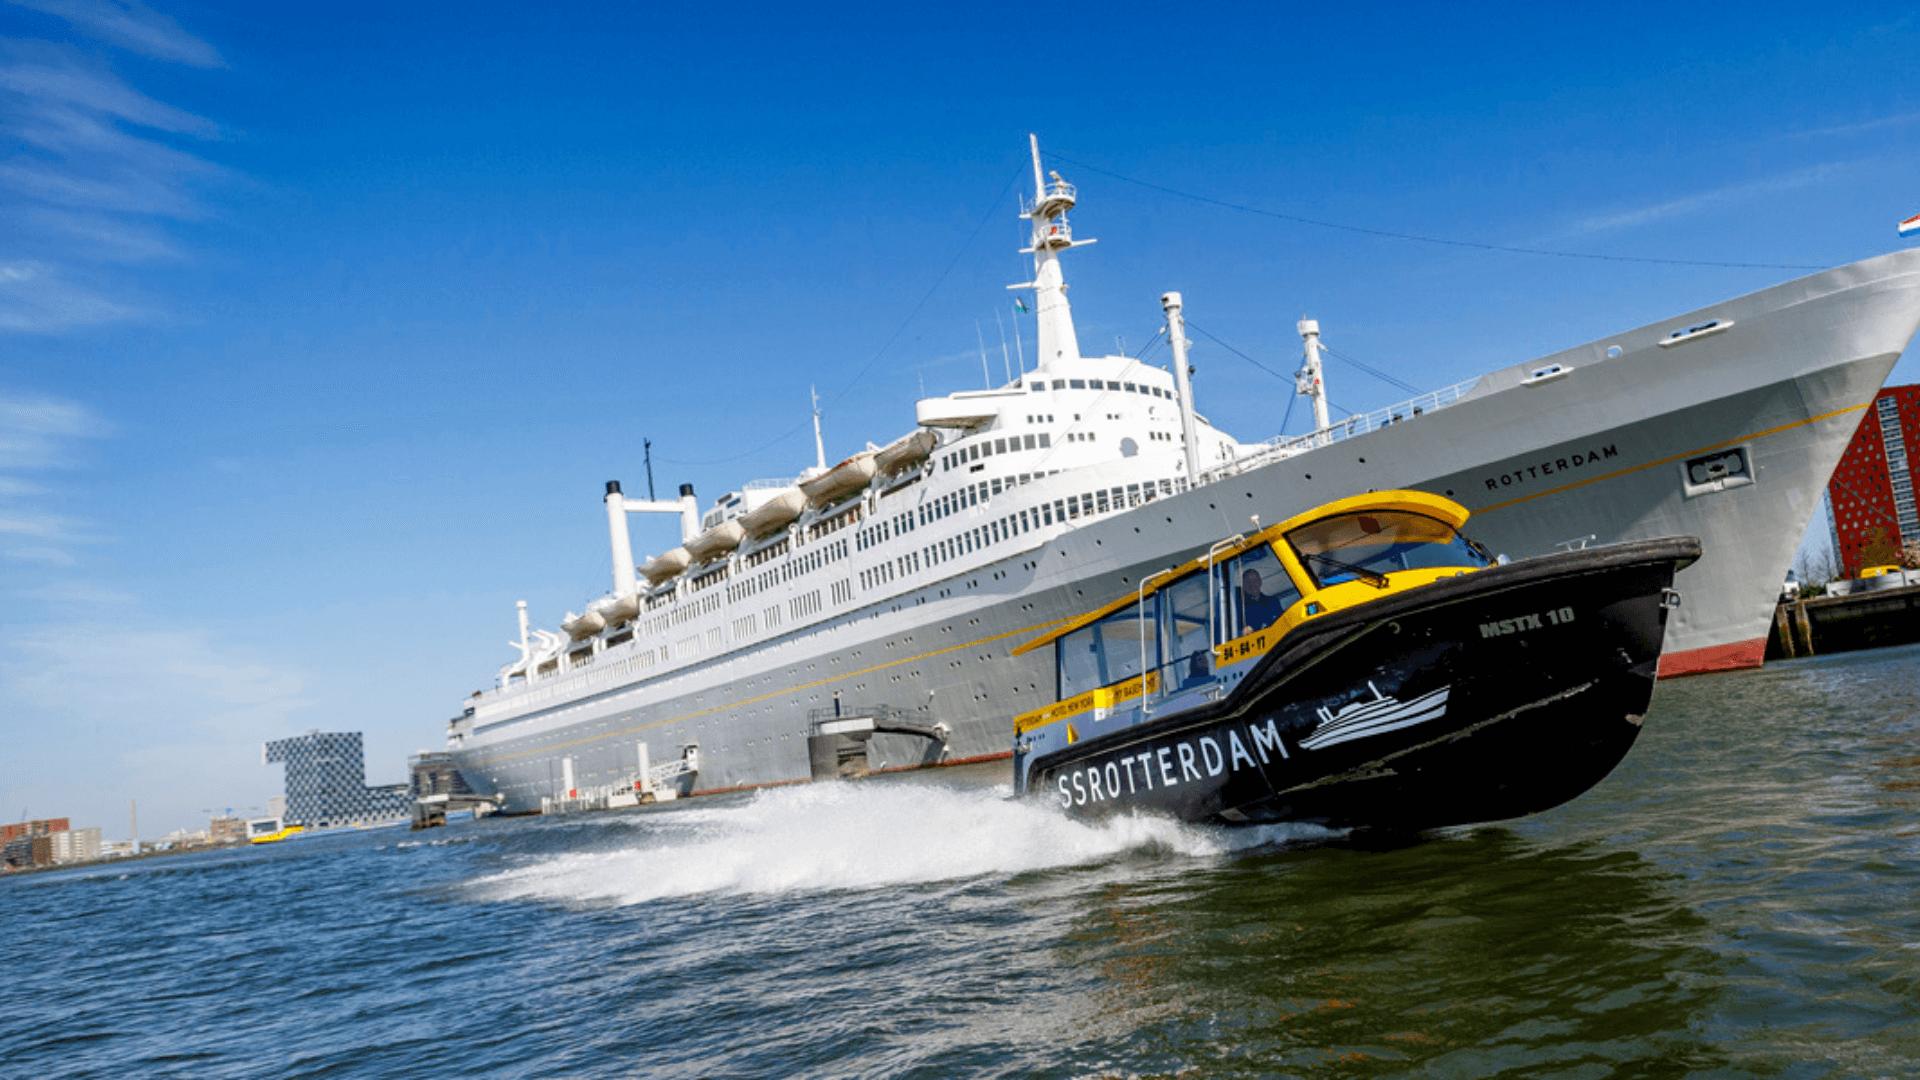 ss Rotterdam Watertaxi